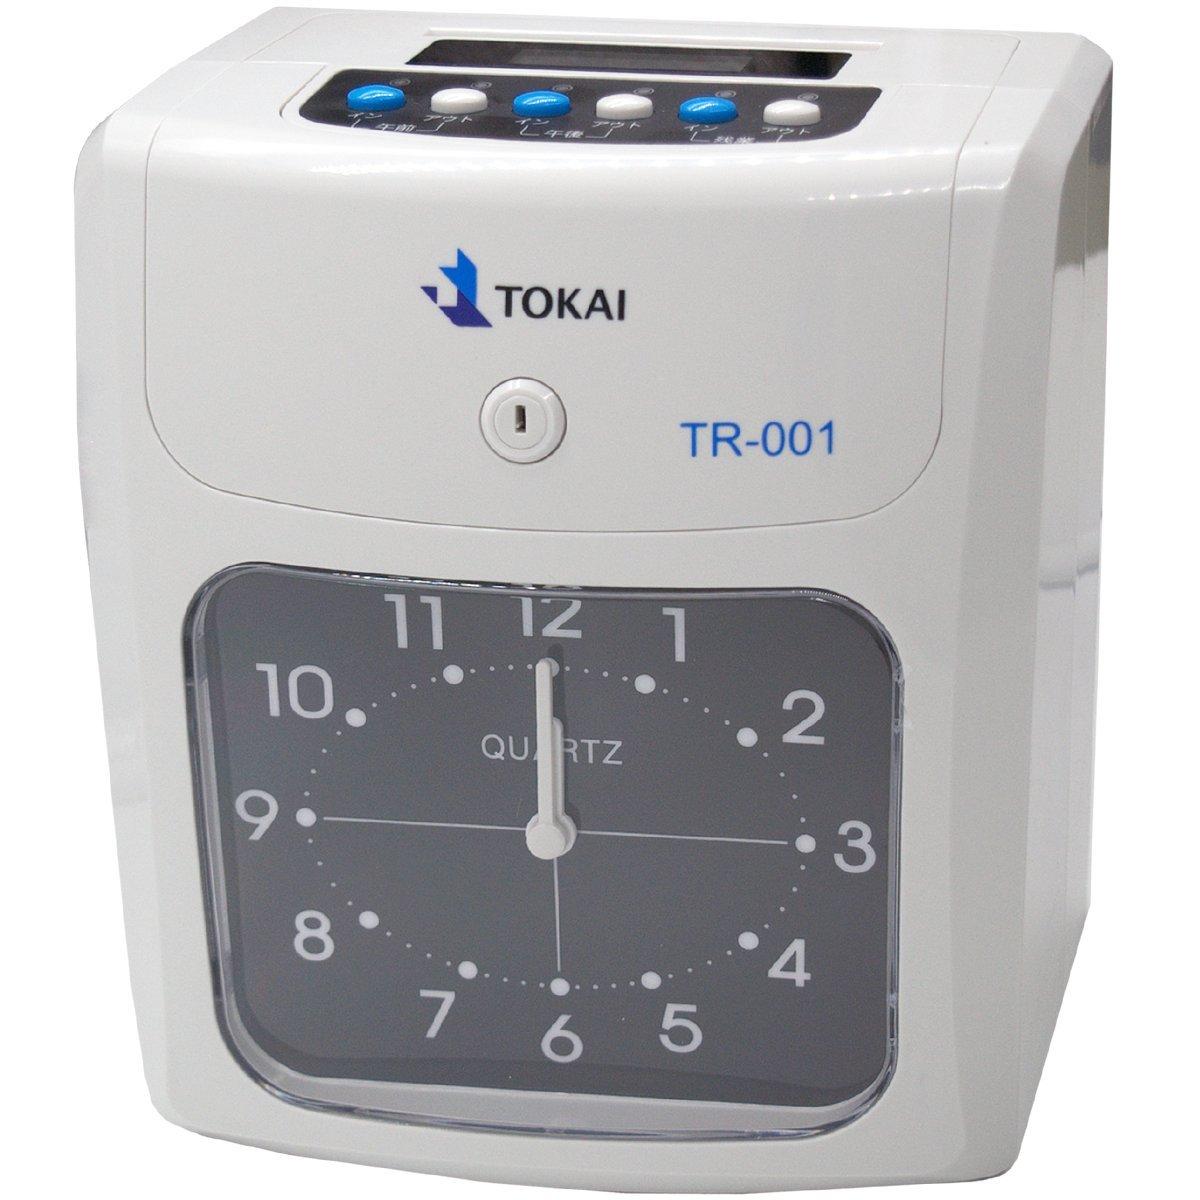 TOKAI タイムカードレコーダー 6欄印字可能 両面印字モデル タイムカード50枚付き TR-001 B013SXFP96